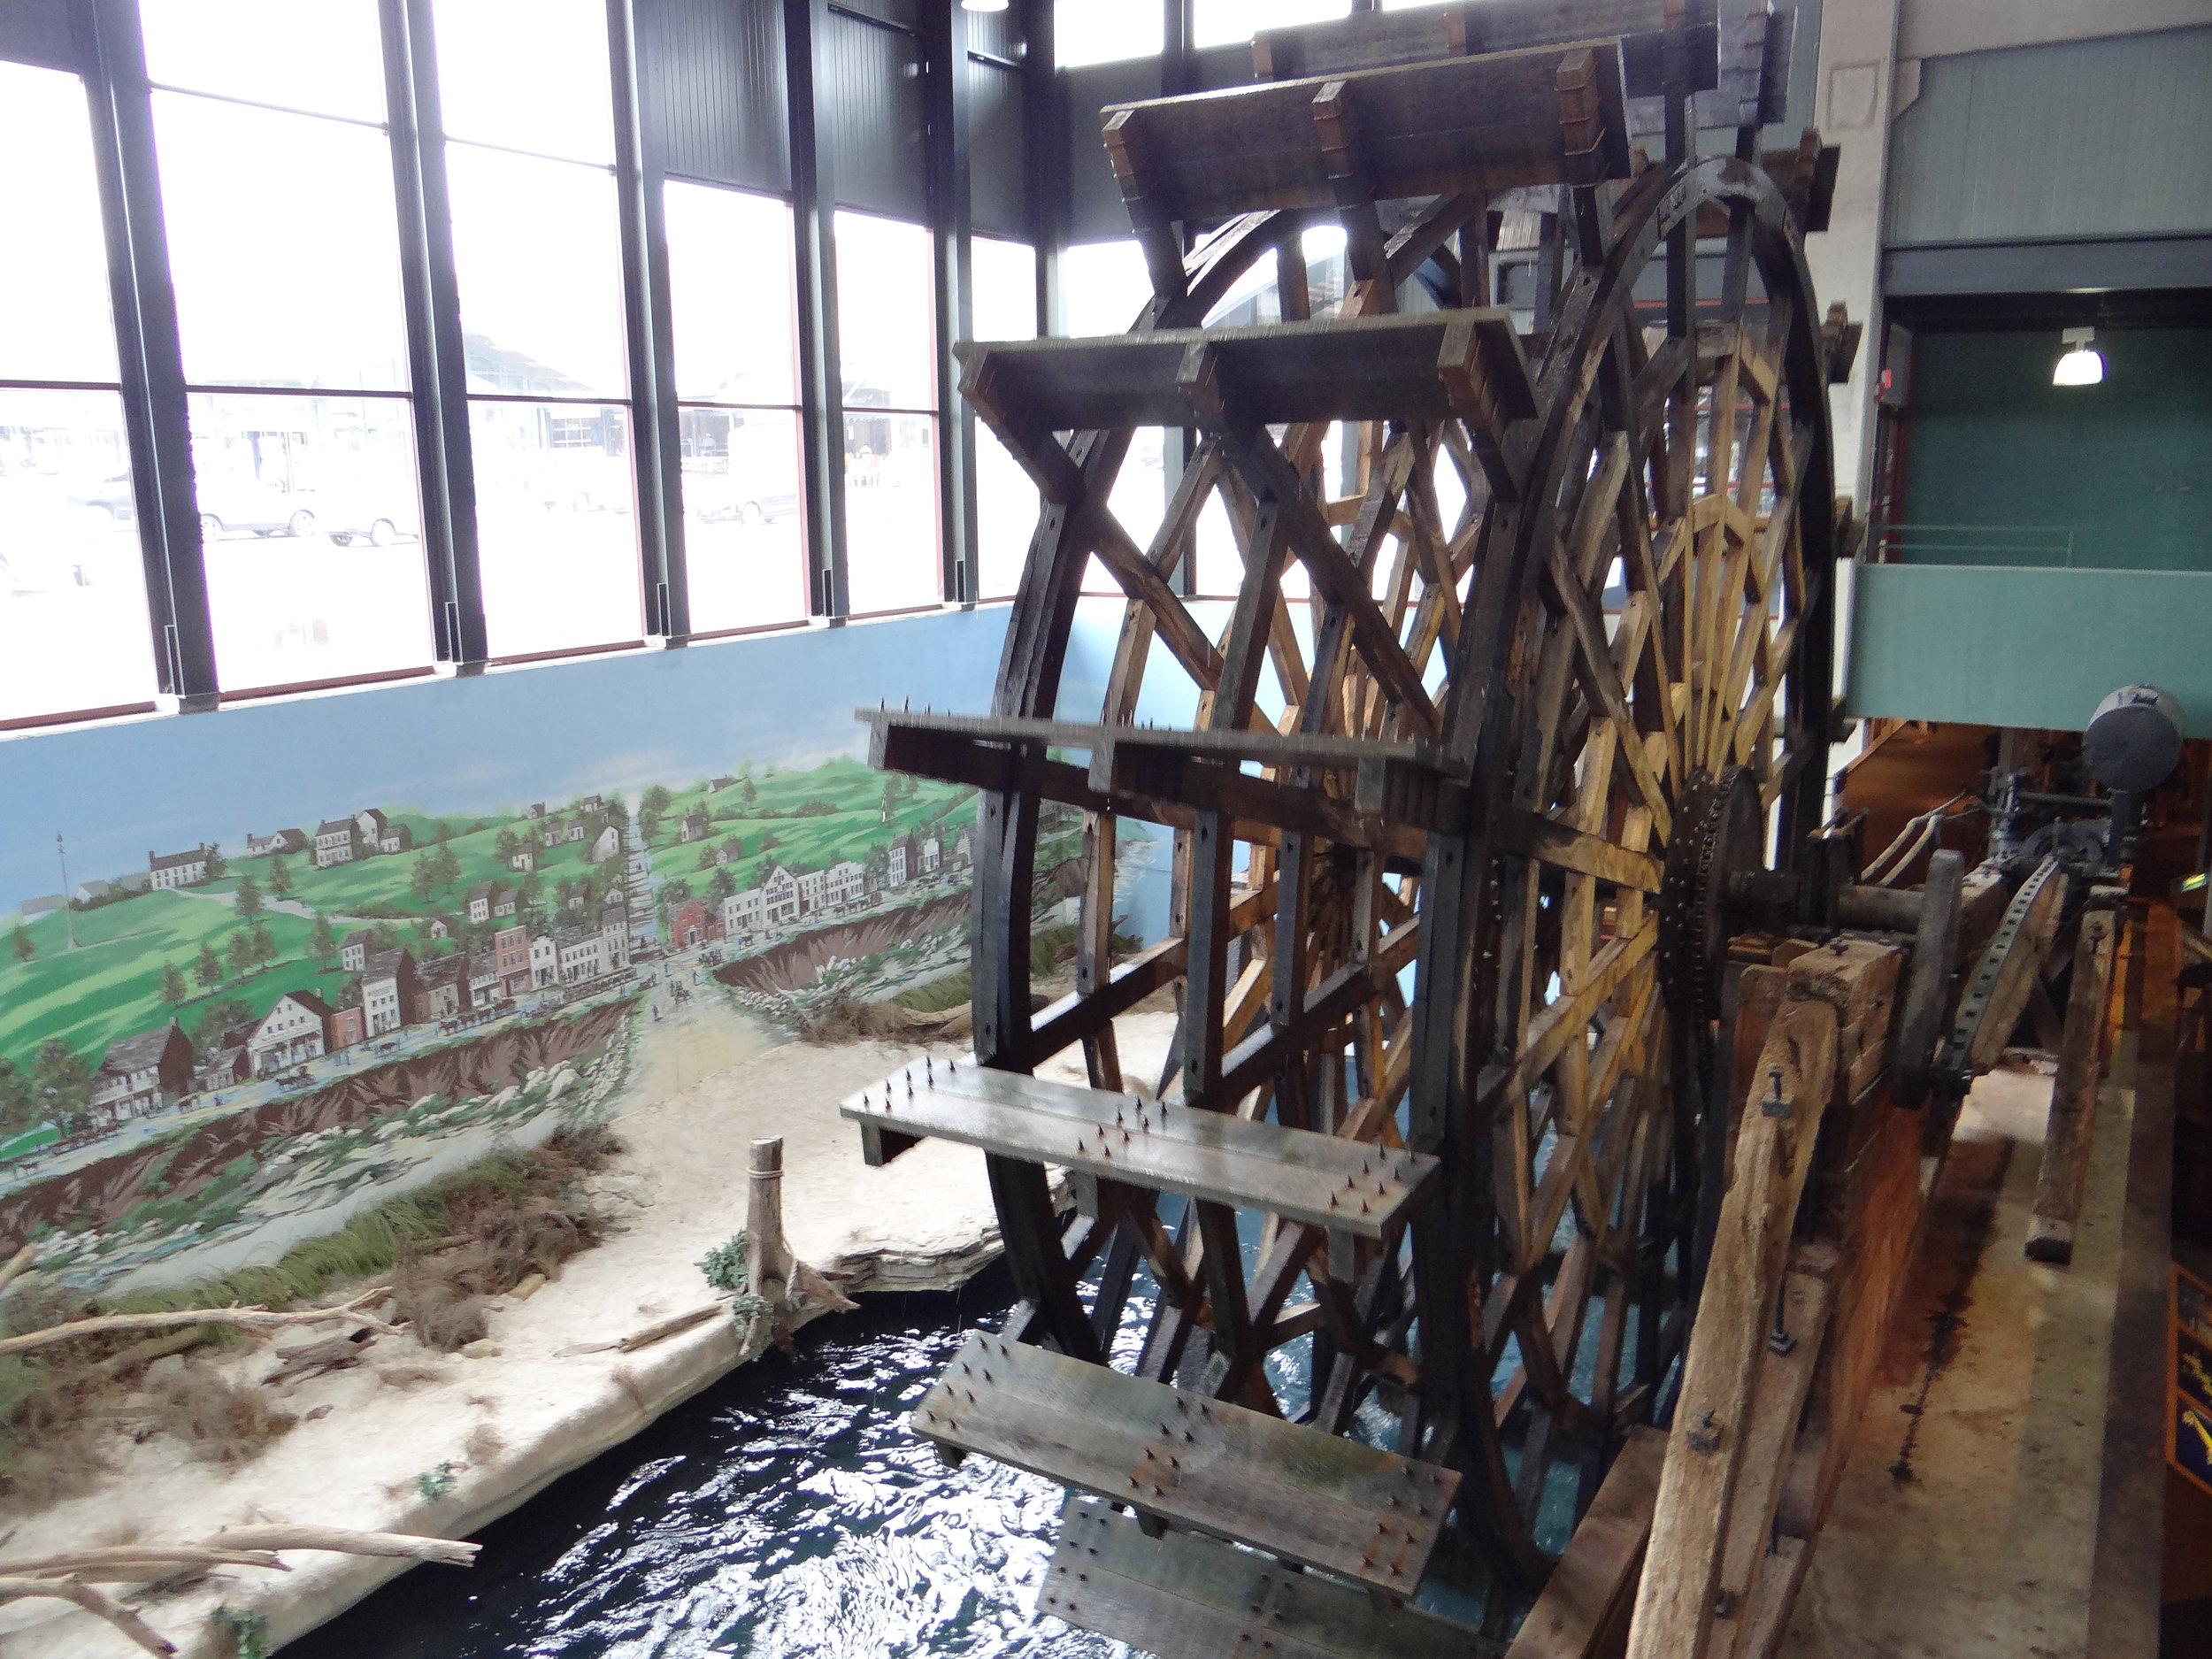 steamboat arabia museum kansas city.JPG